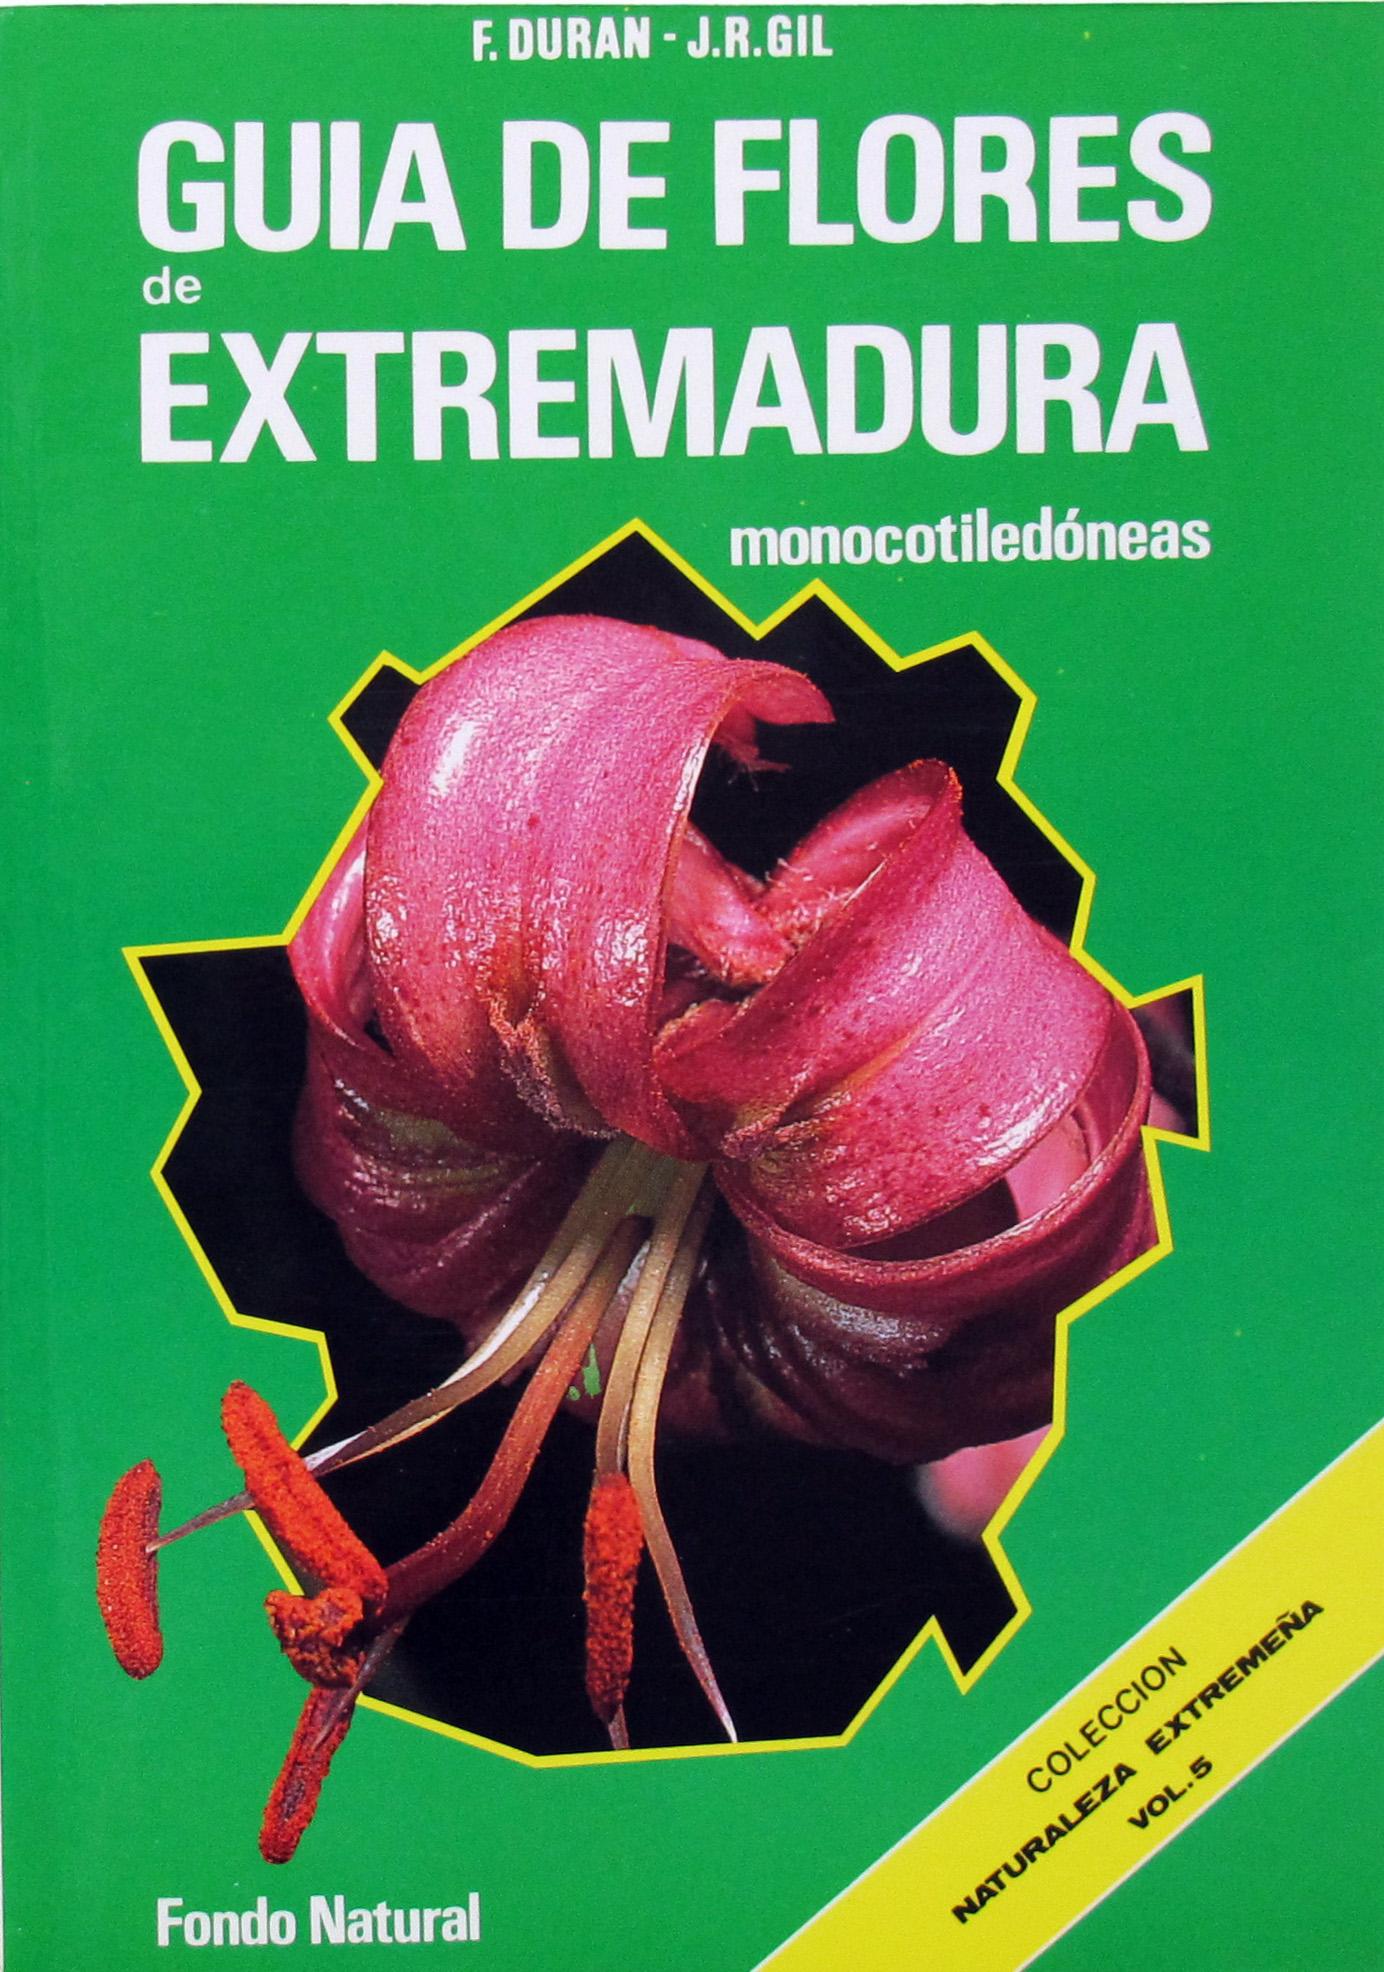 Libro GUIA DE FLORES DE EXTREMADURA - Monoc